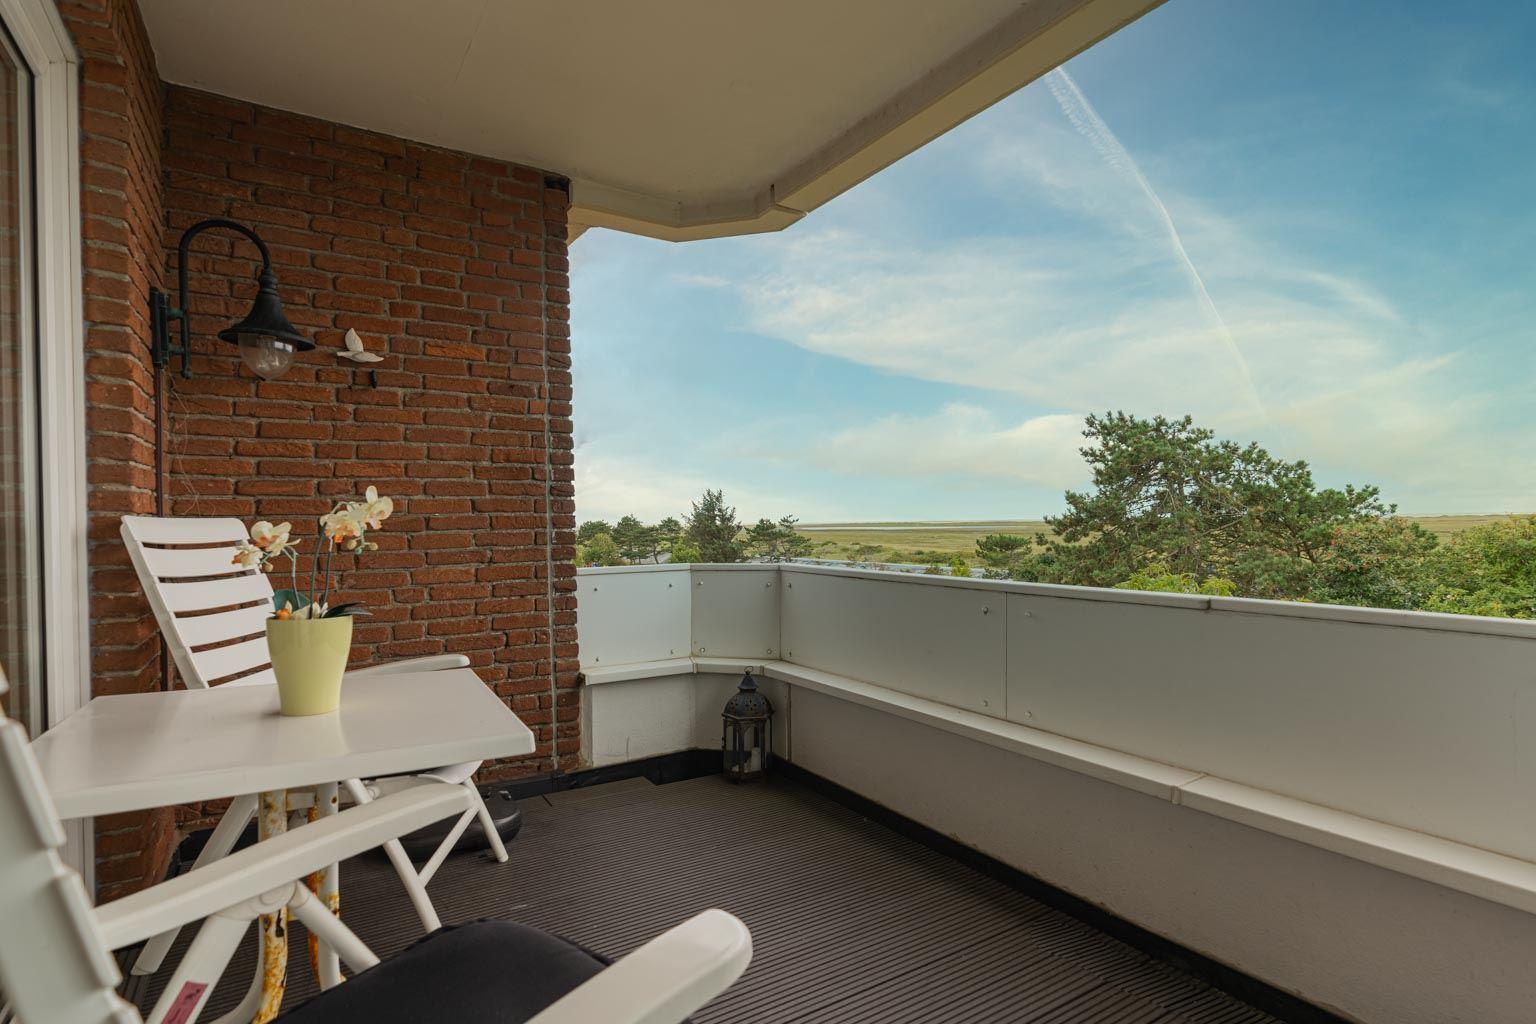 Südwest-Balkon mit Panorama-Meerblick